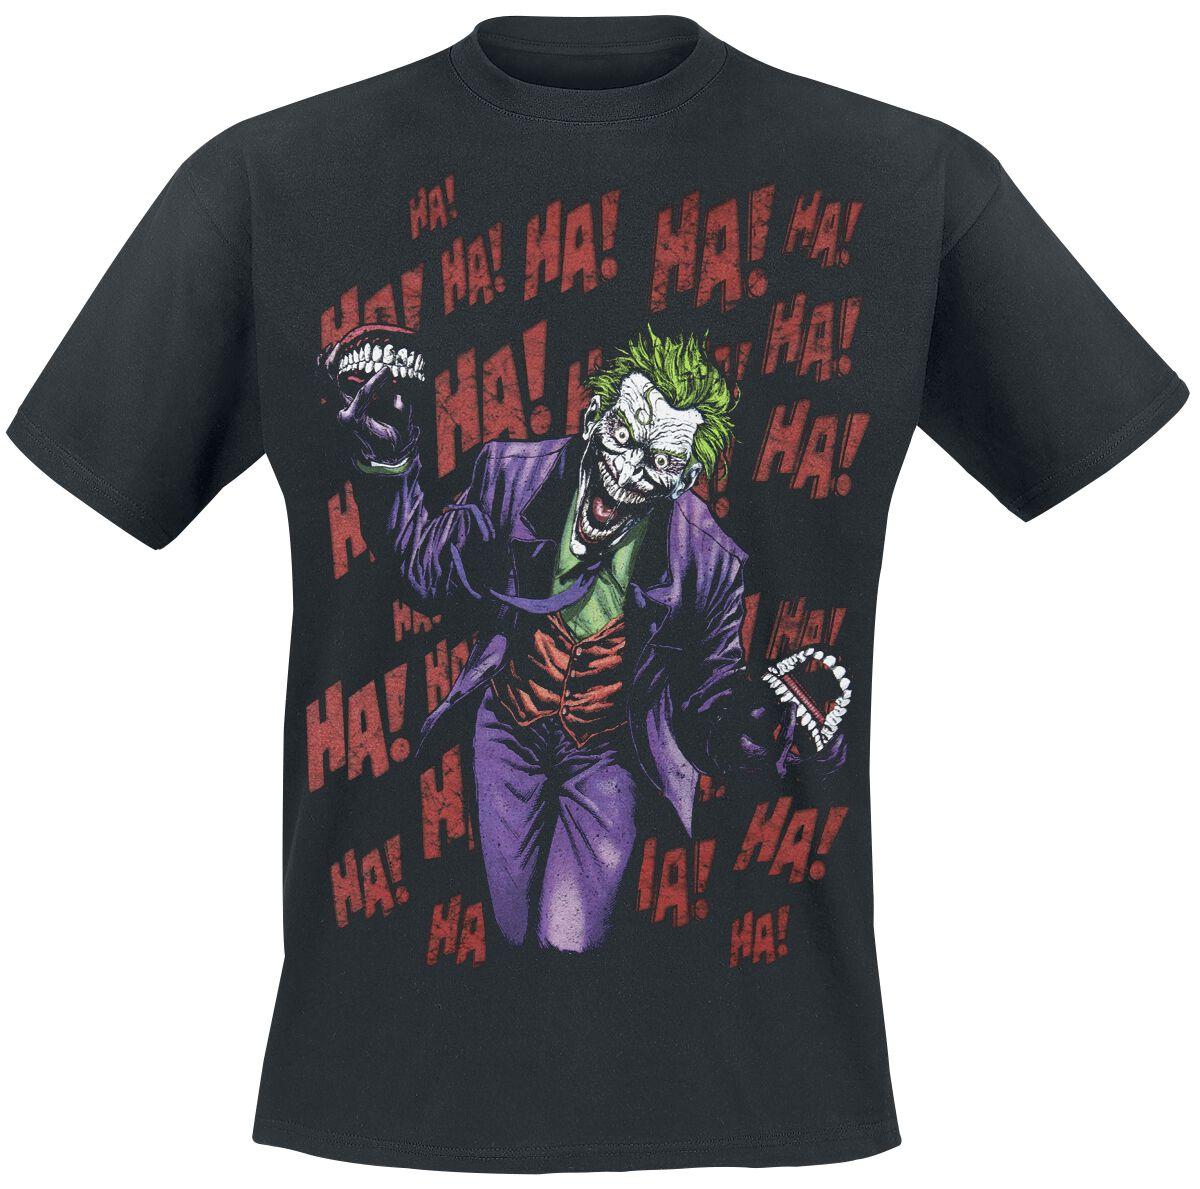 Merch dla Fanów - Koszulki - T-Shirt The Joker Ha! Ha! Ha! T-Shirt czarny - 335607